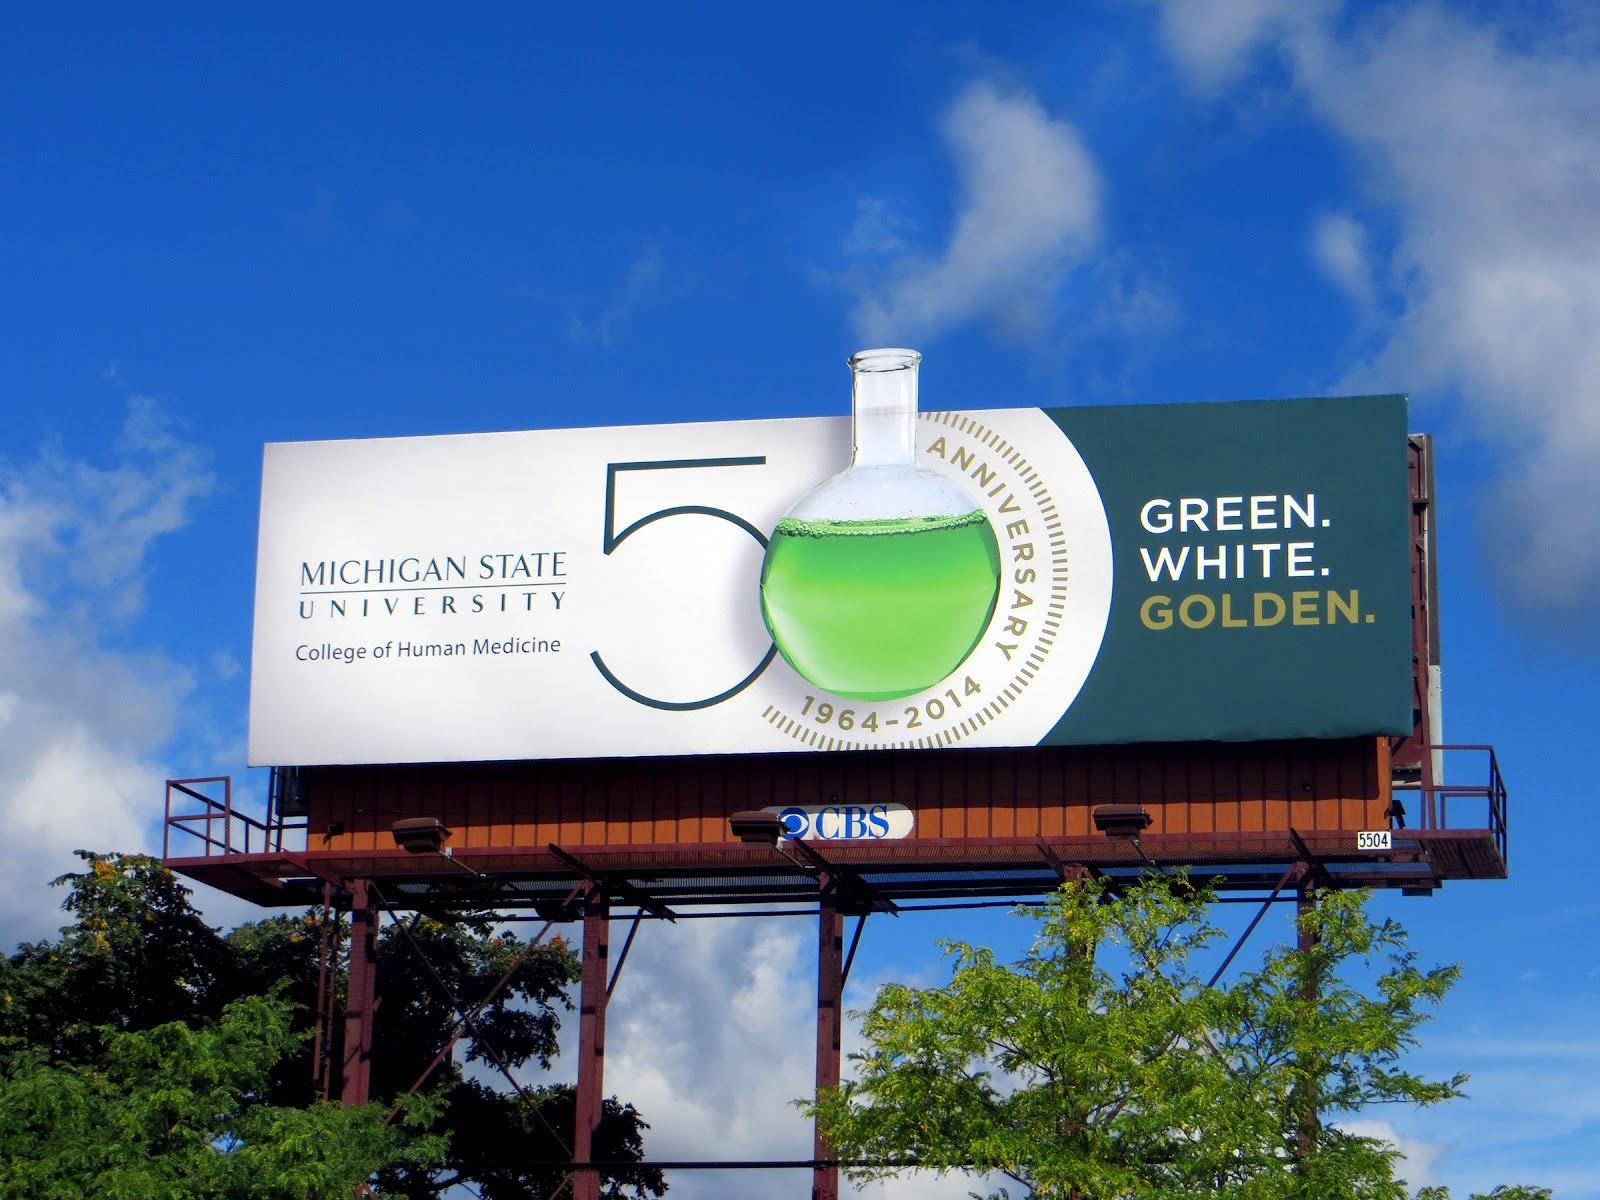 billboard by Michigan State University celebrating 50 years